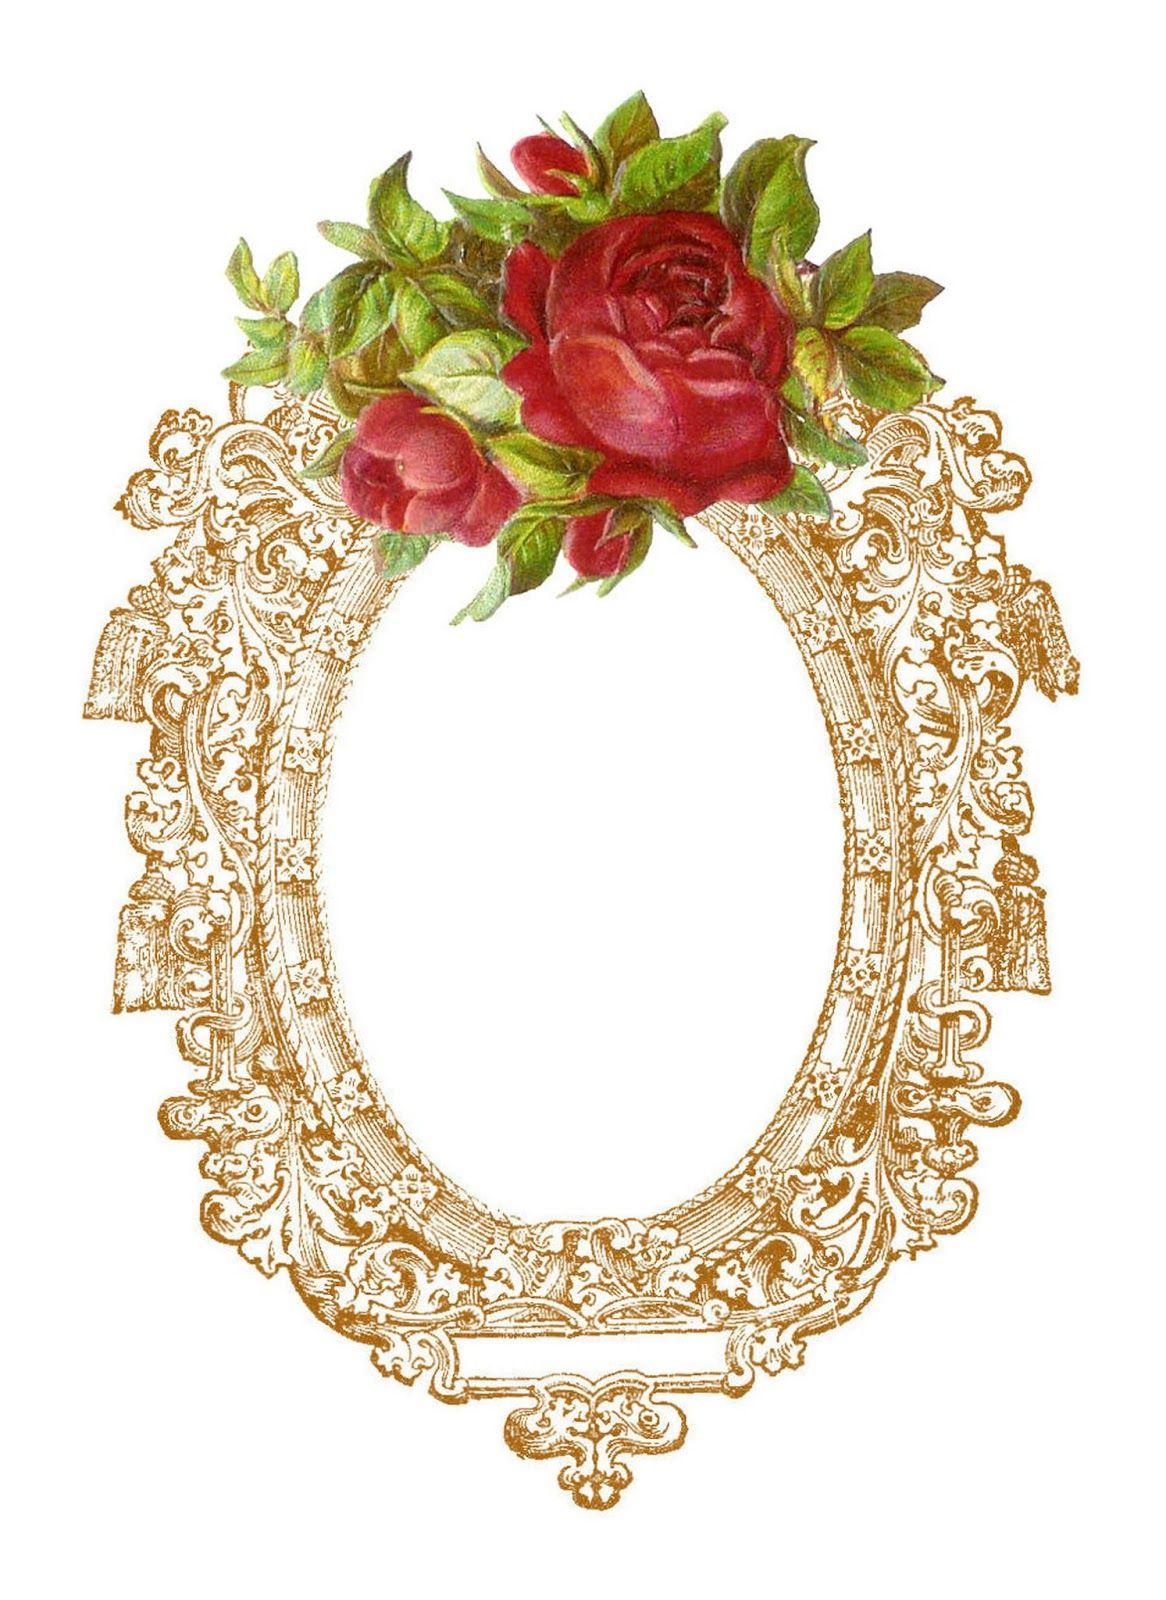 Vintage Flowers Clip Art Borders | ... Digital Frame Graphic ...